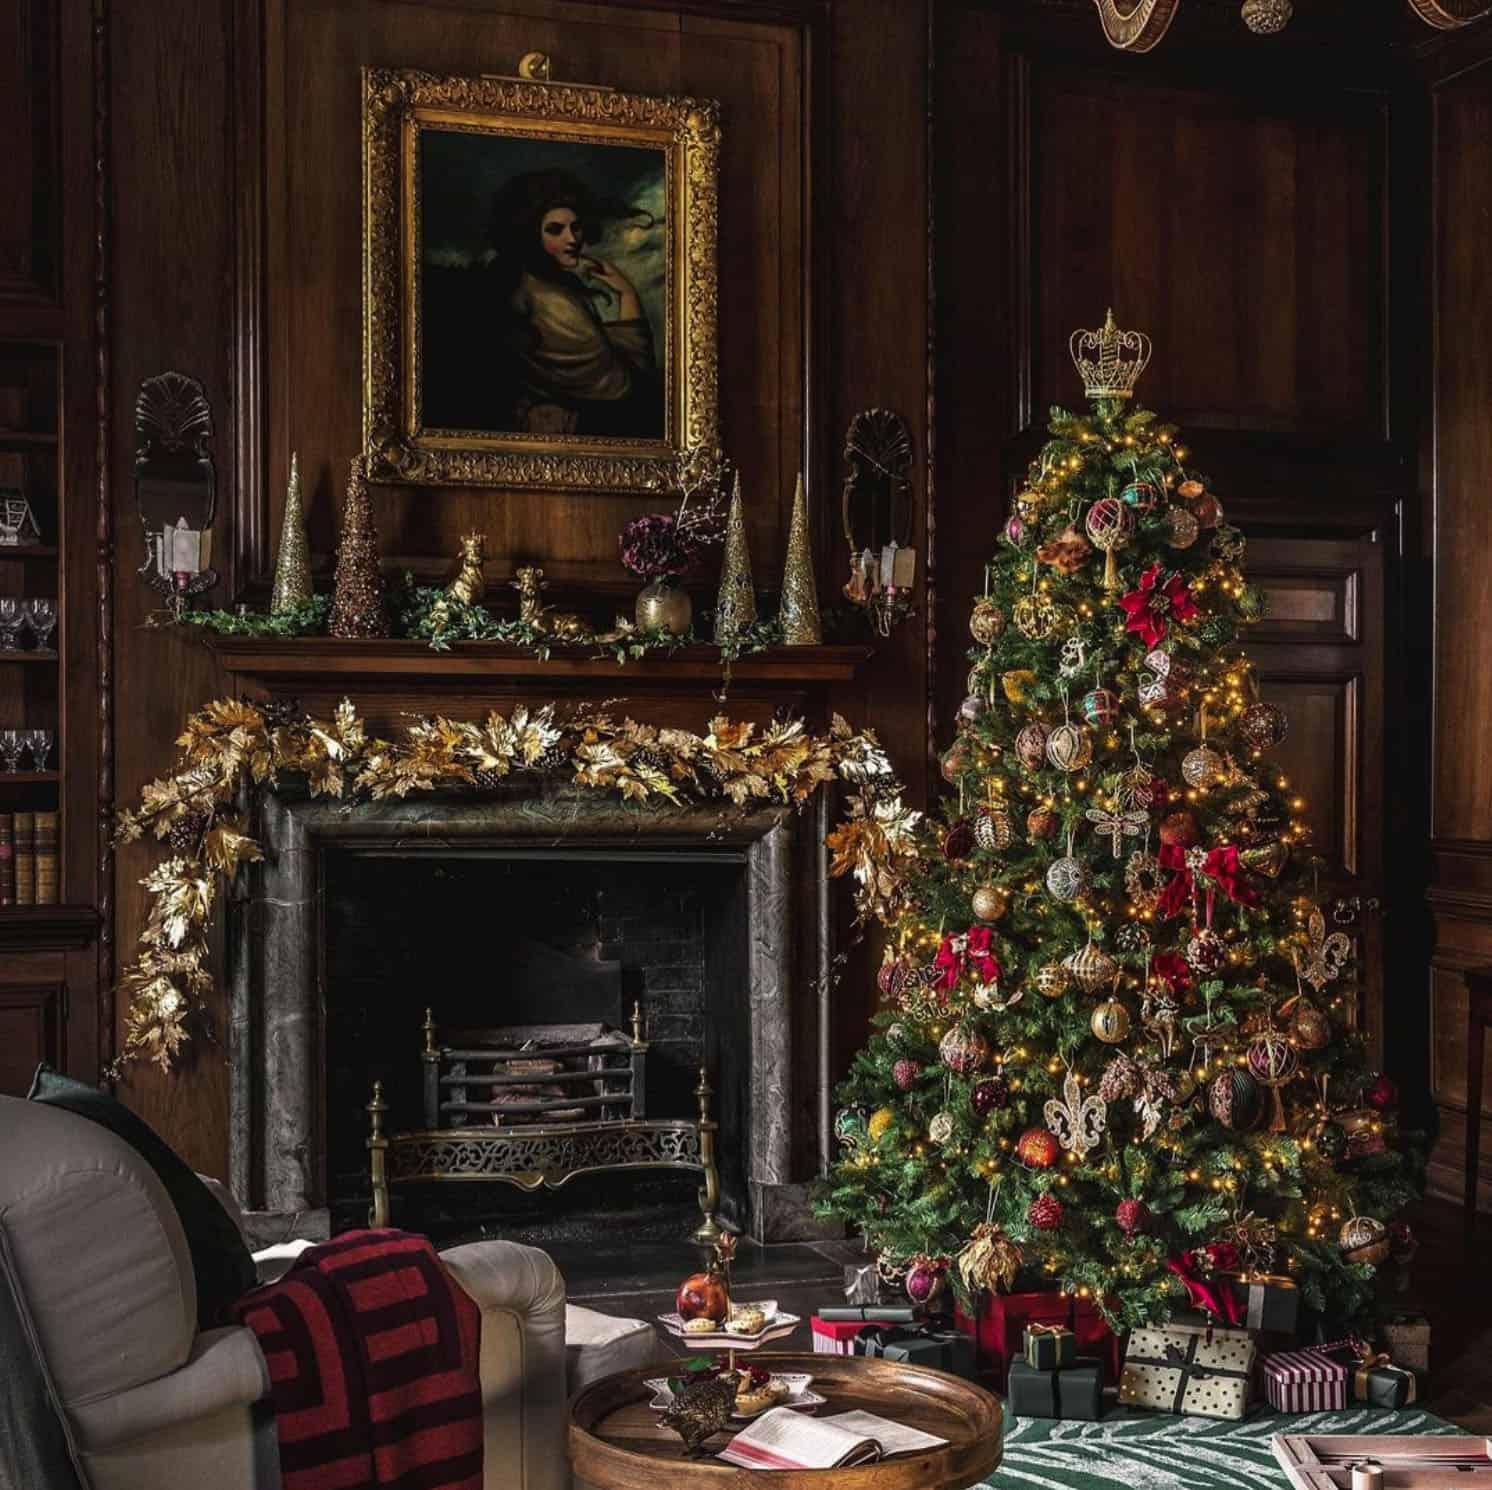 holiday-decor-ideas-christmas-living-room-fireplace-tree